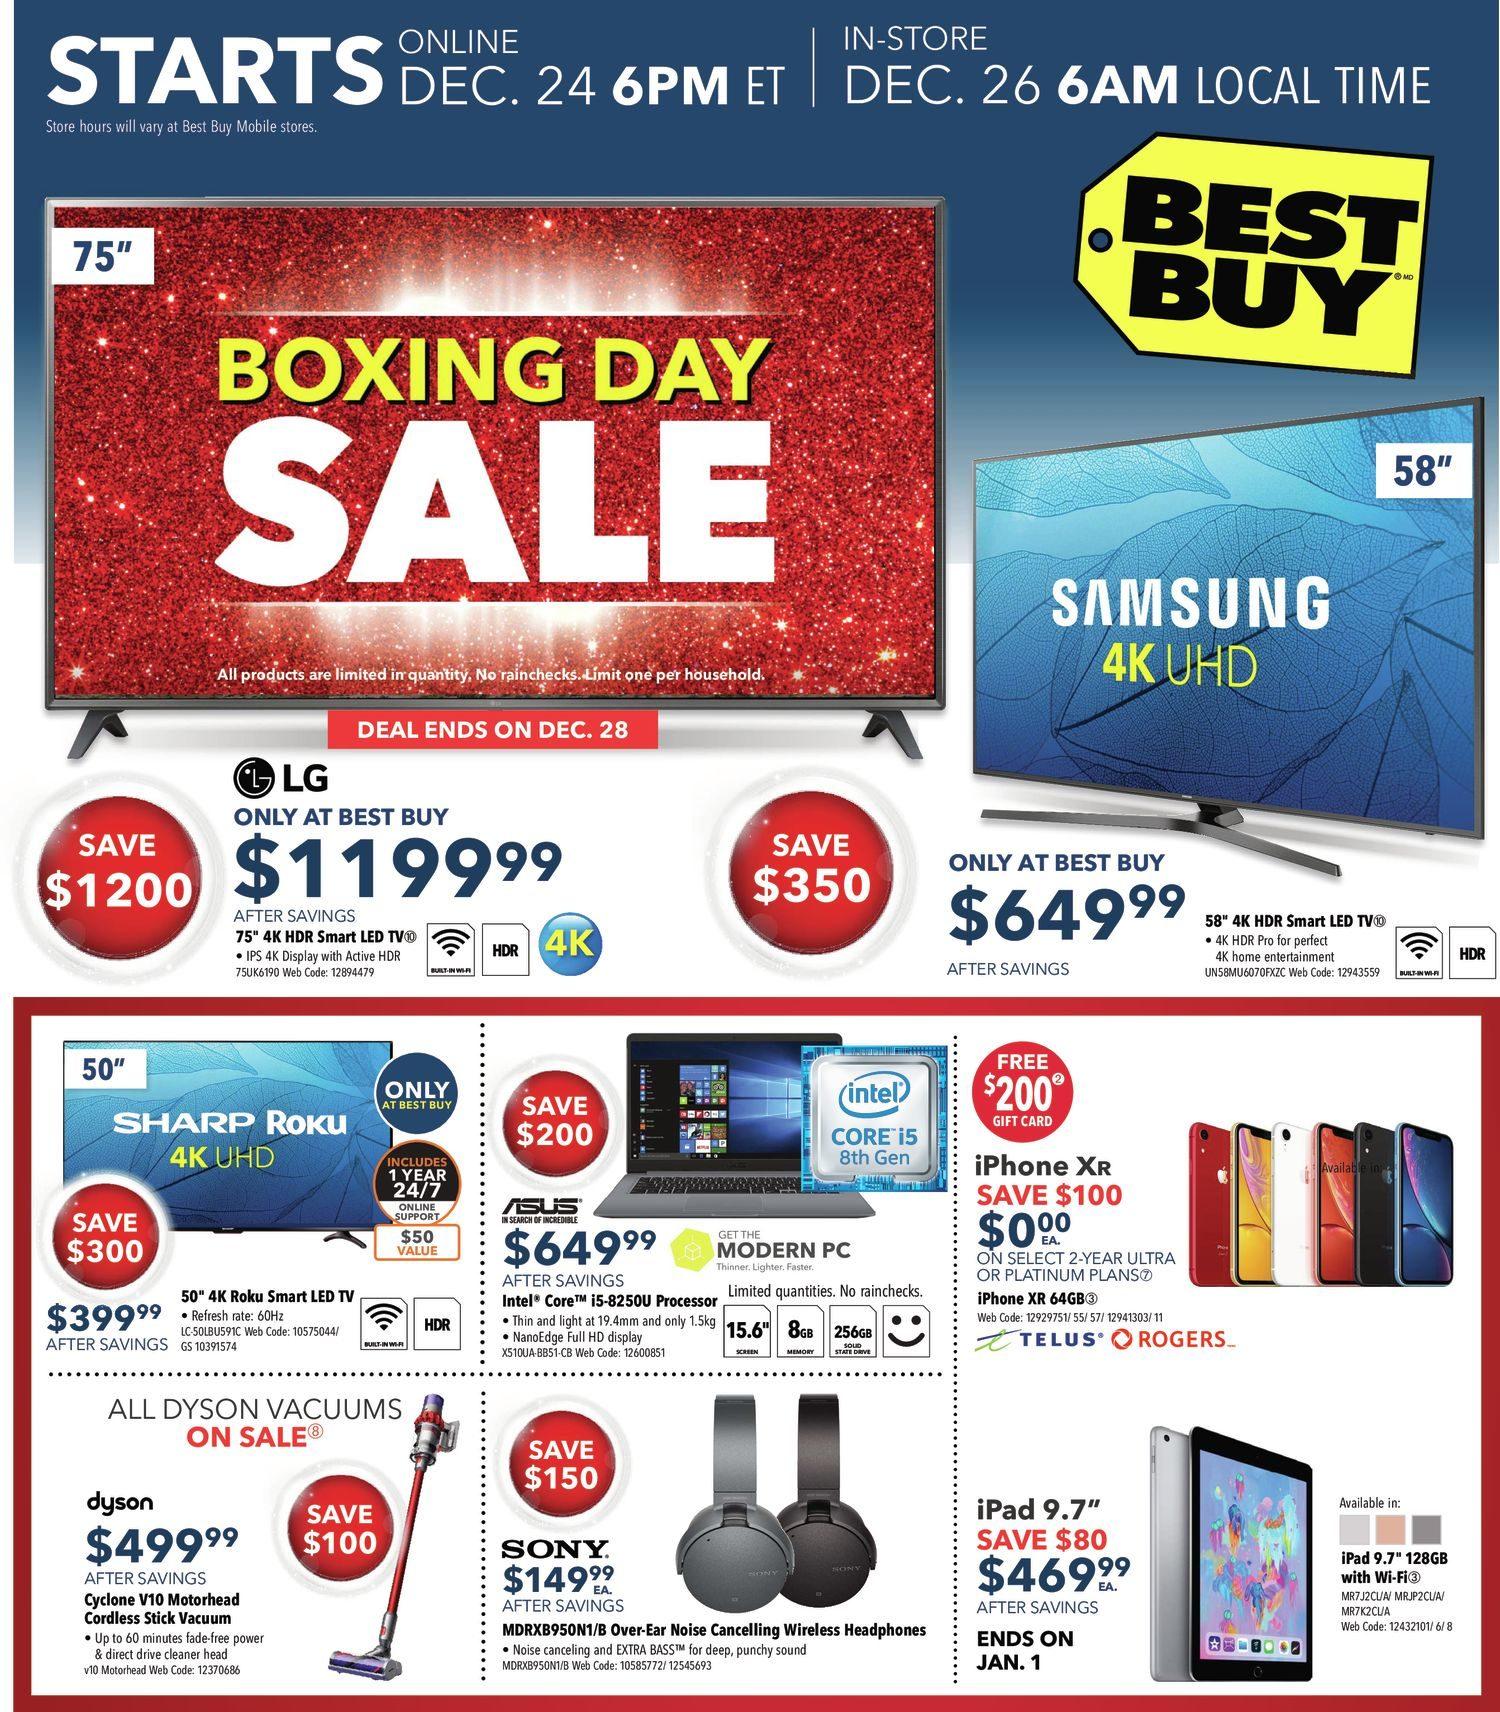 82e89aac602 Best Buy Weekly Flyer - Boxing Day Sale - Dec 25 – Jan 3 - RedFlagDeals.com